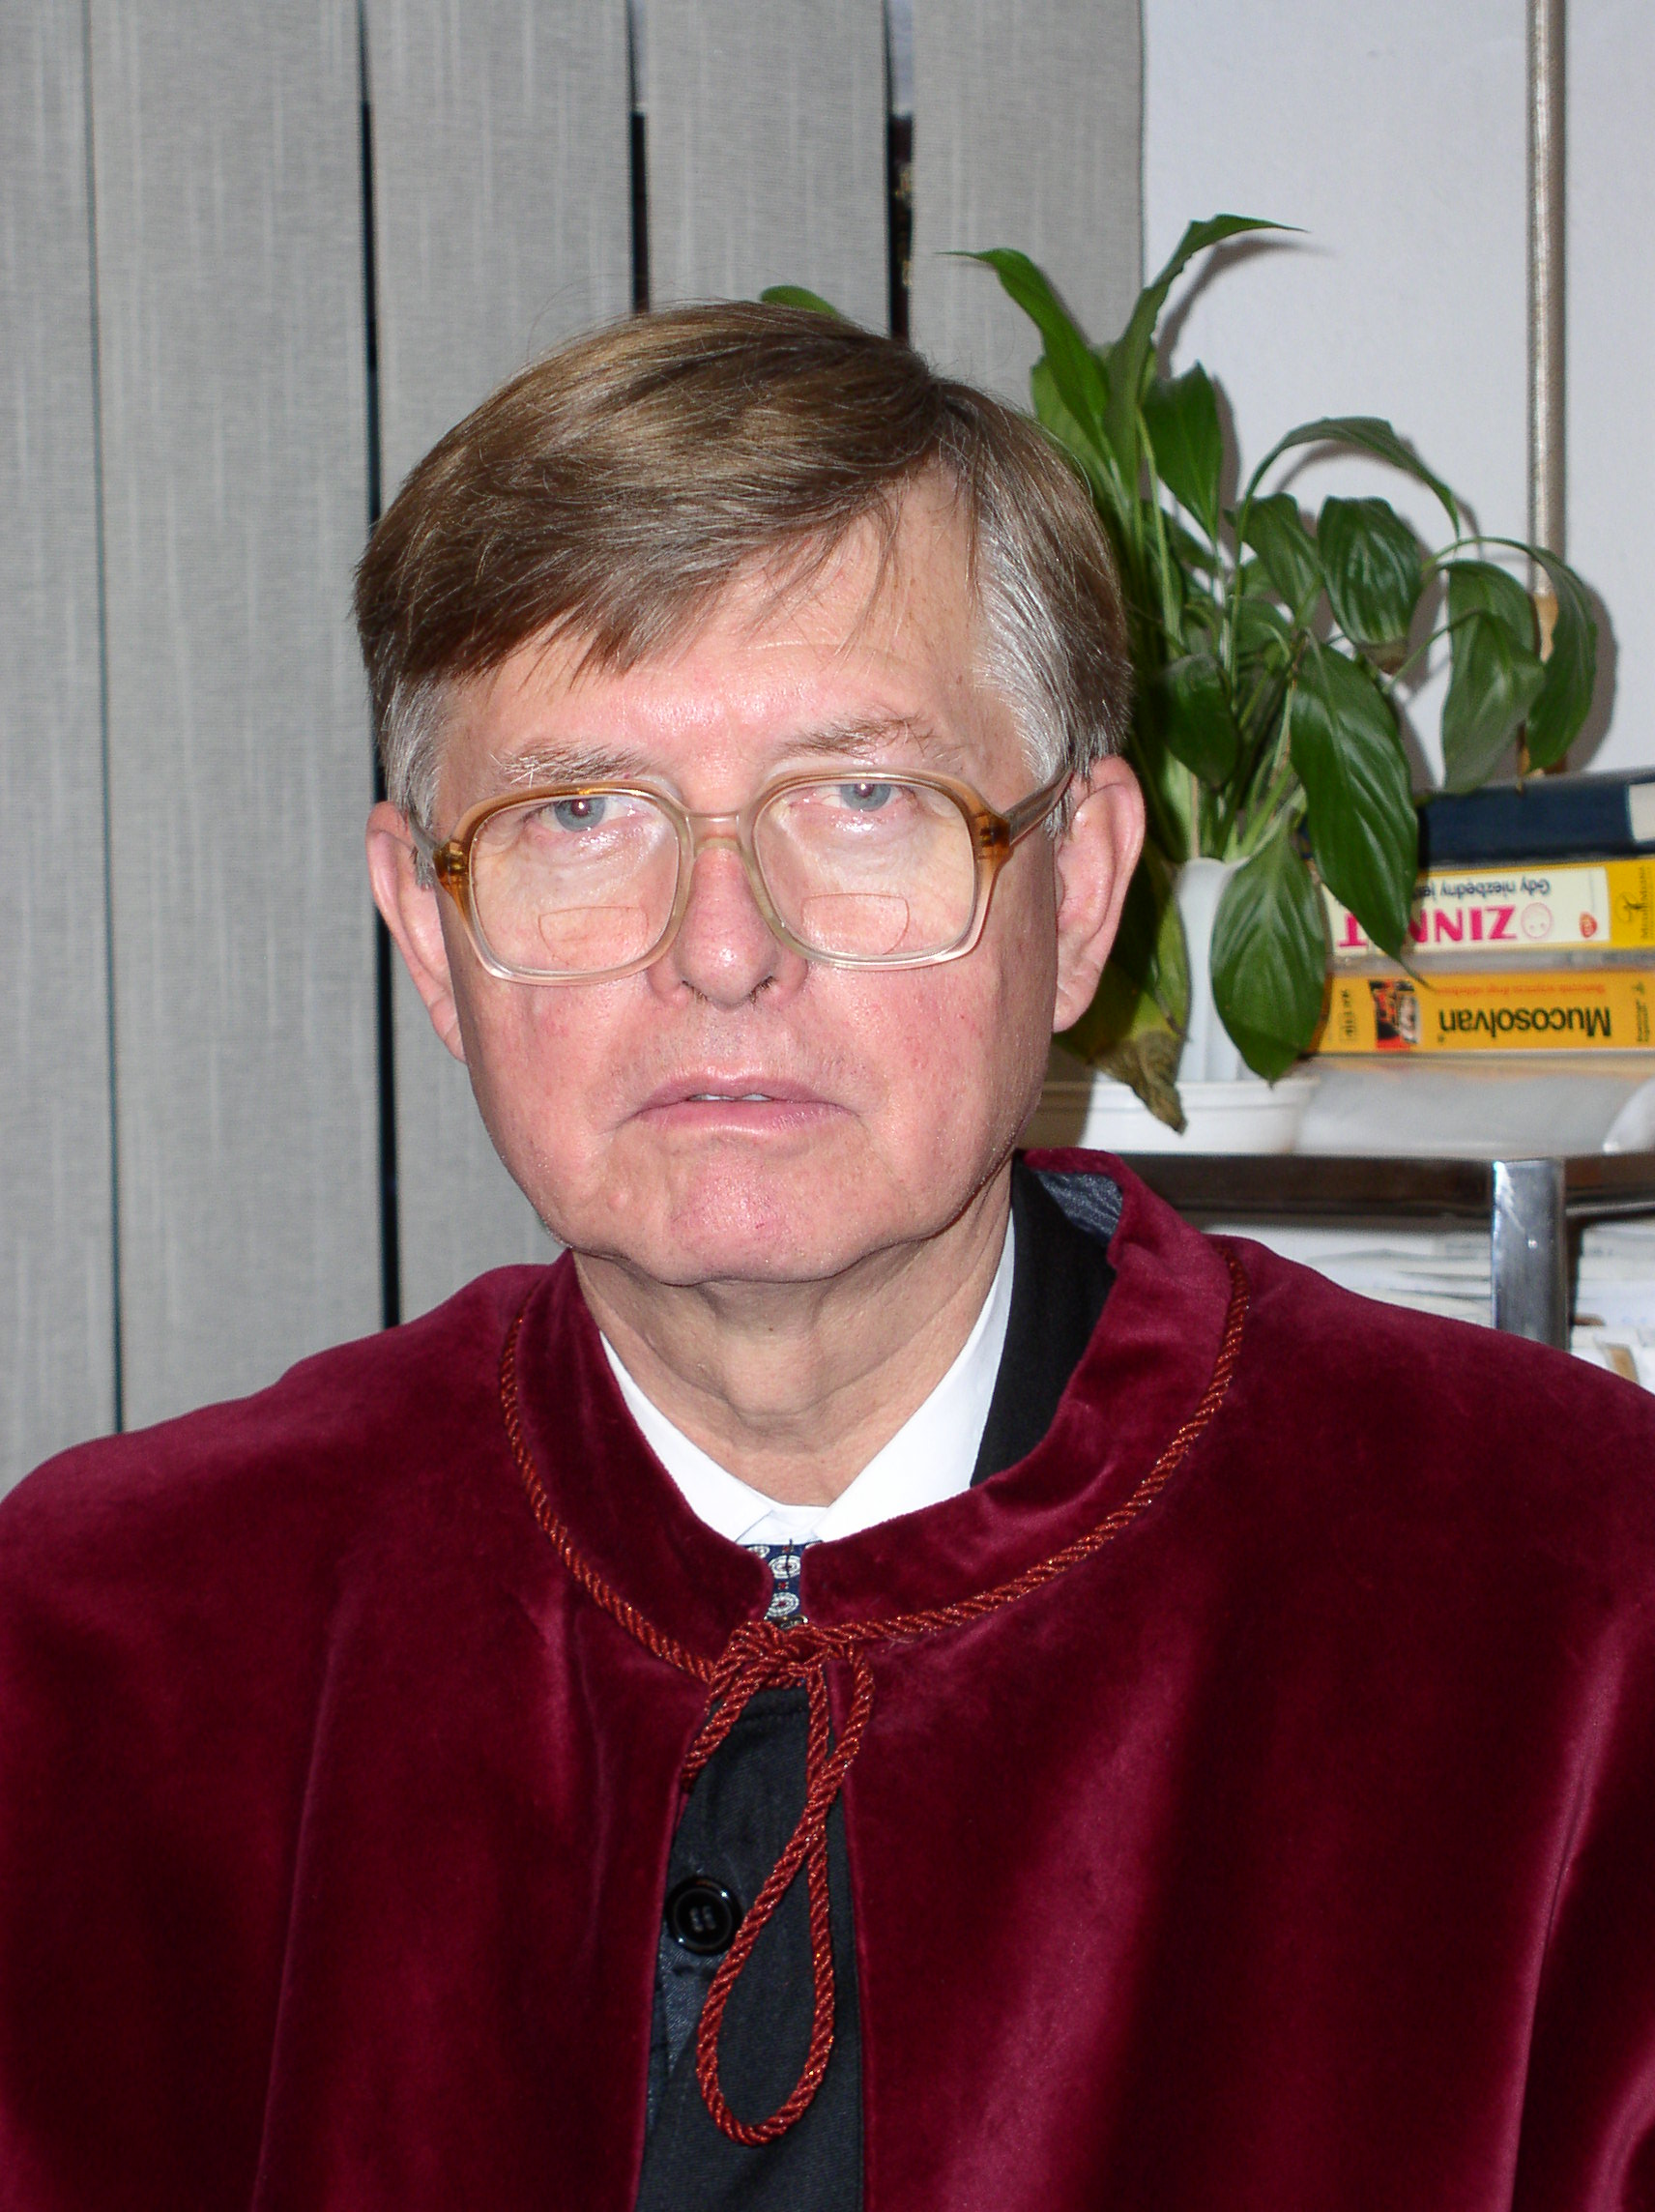 Dr. Tomasz Karski